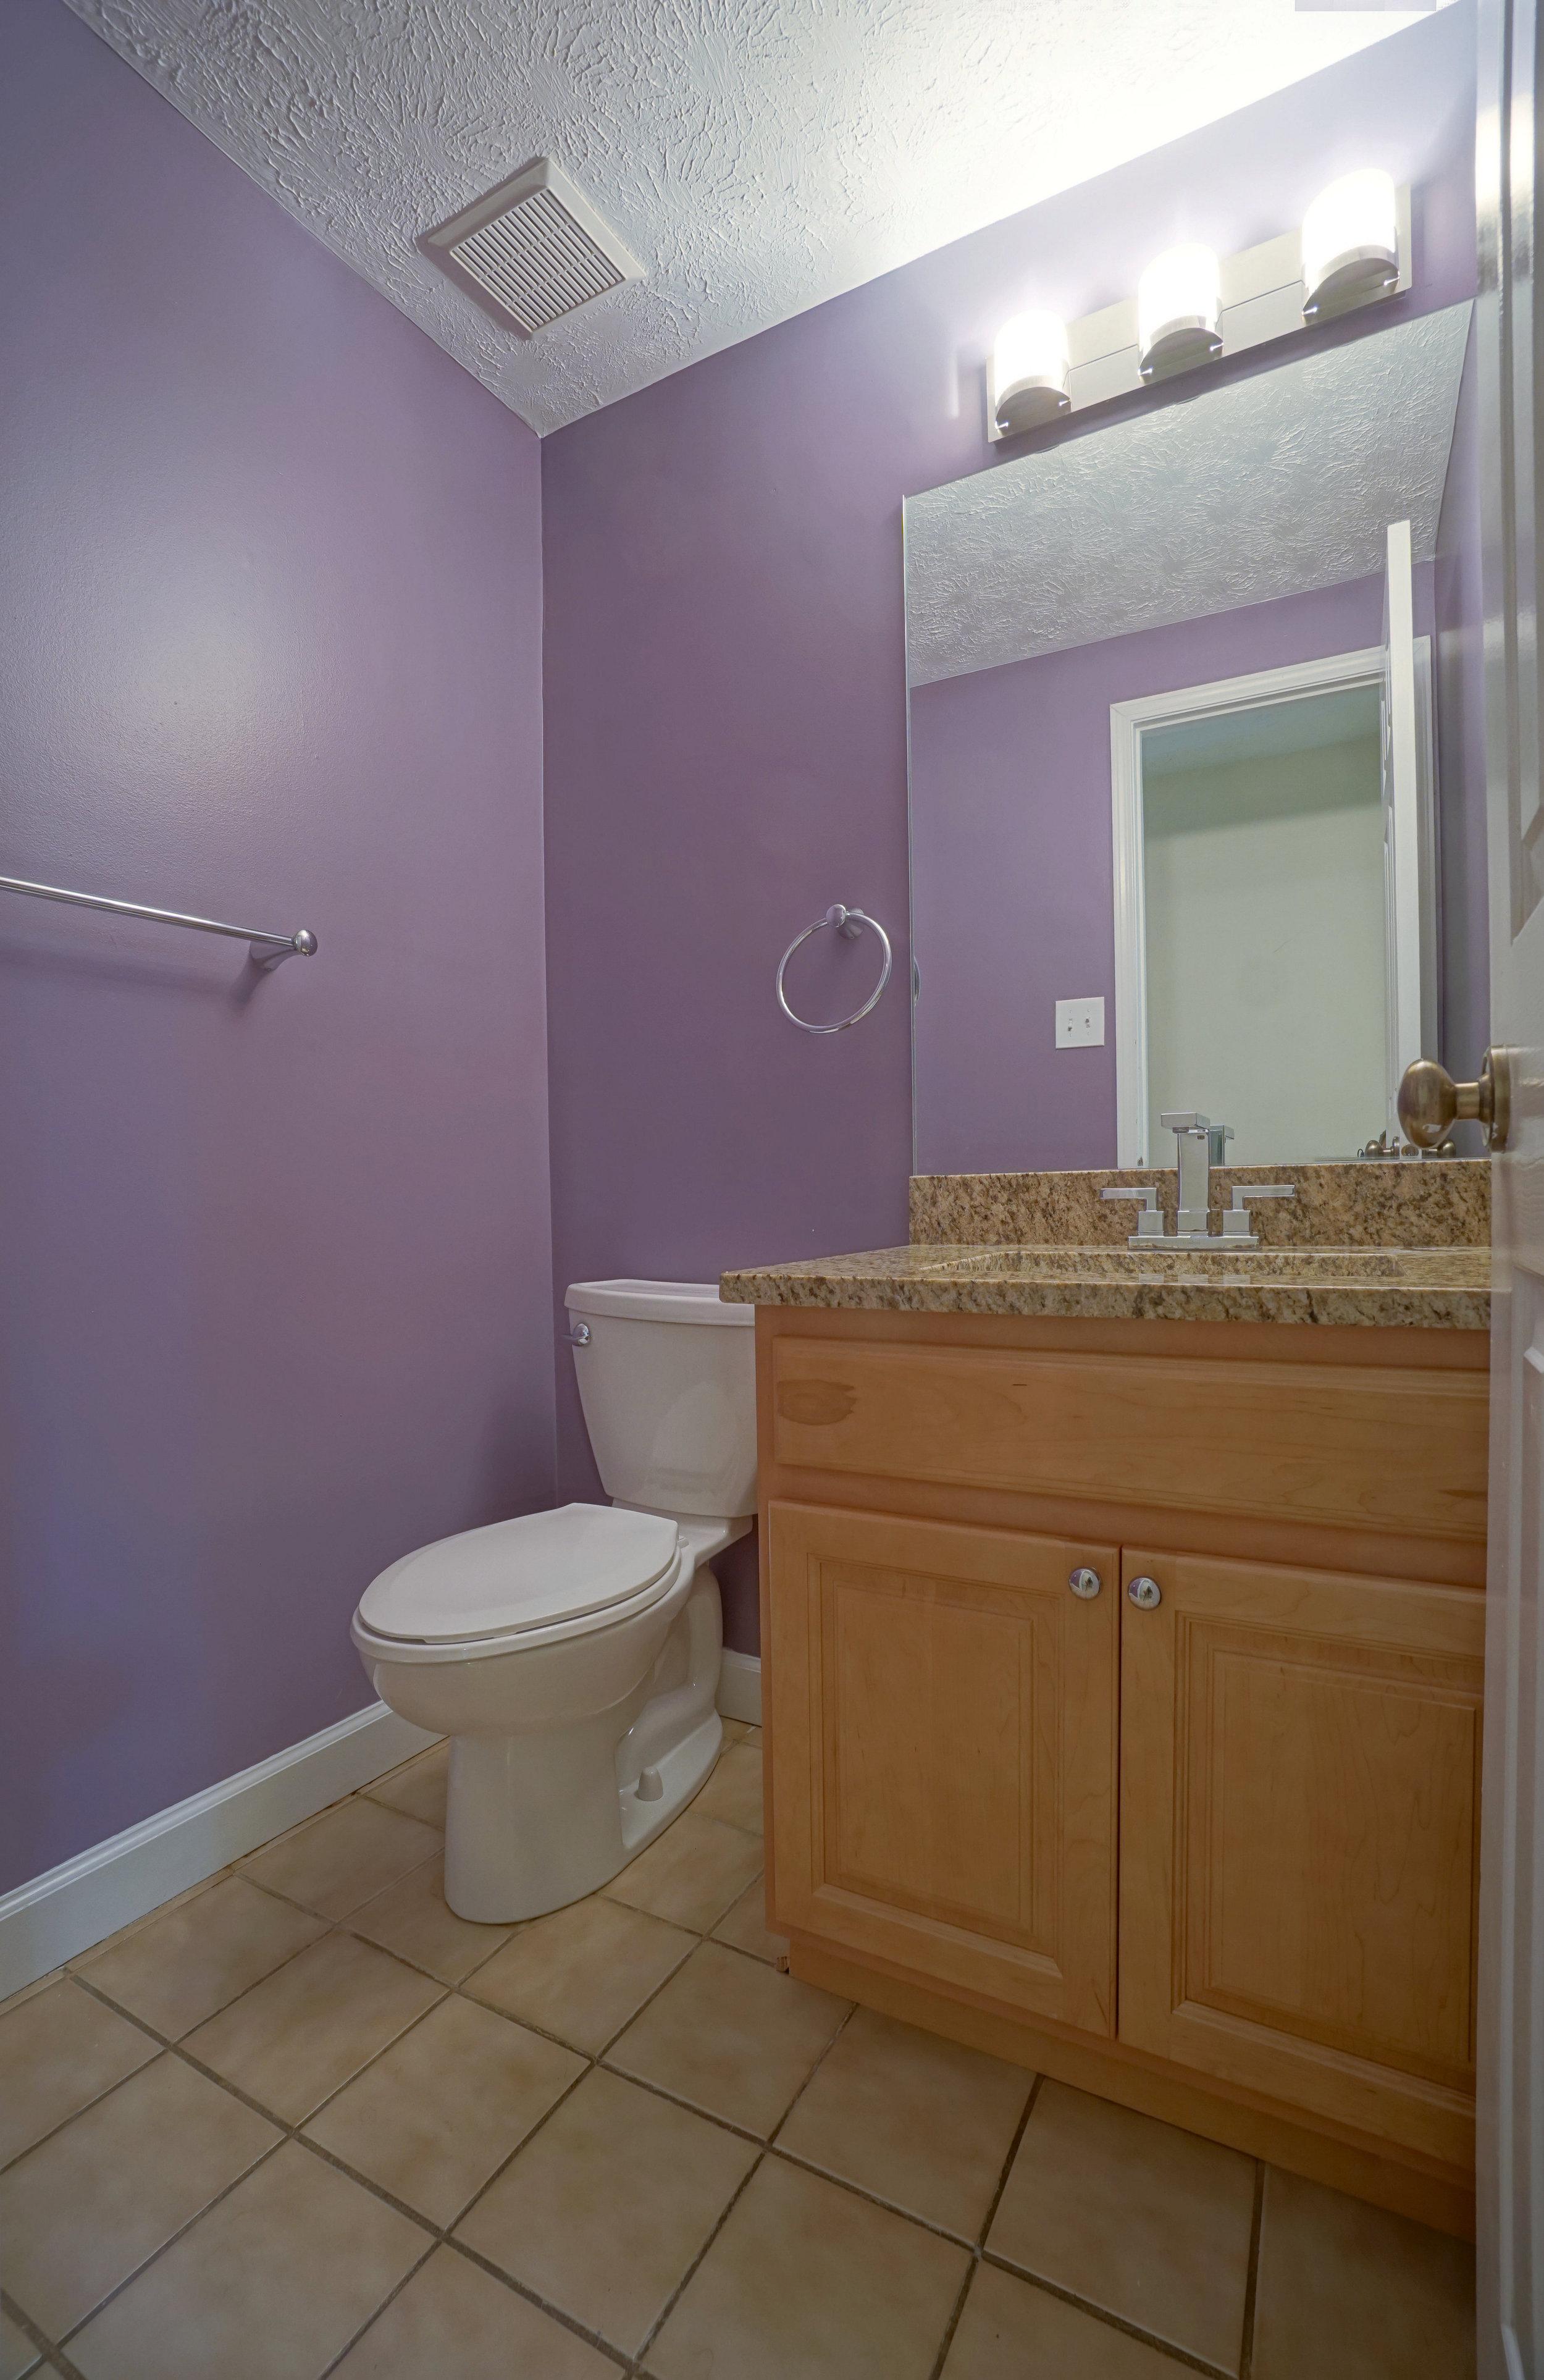 Bathroom Remodeling Ellicott City Md bathroom remodeling ellicott city md